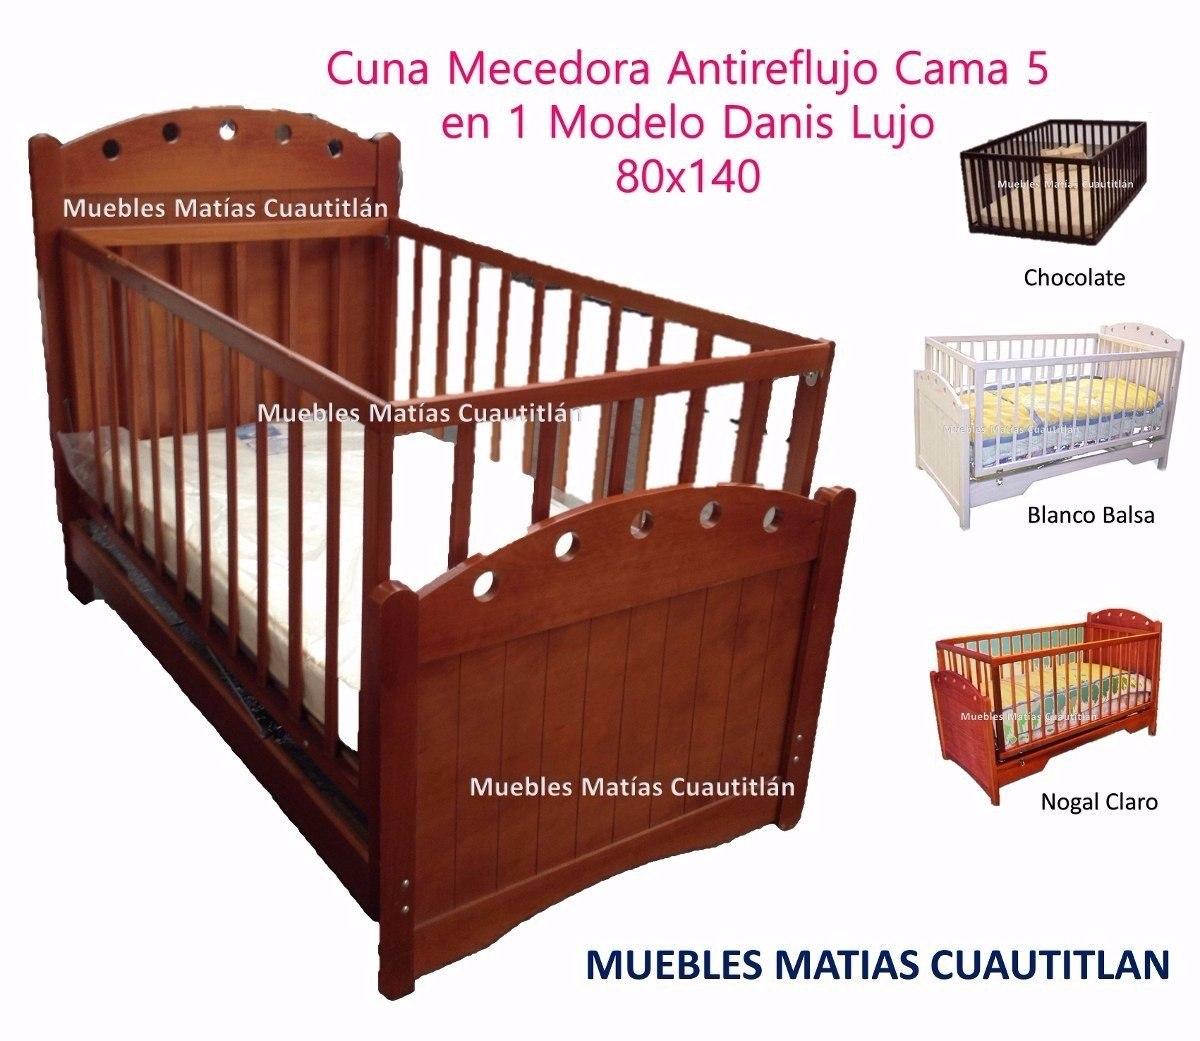 Cuna Cama Mecedora Funcional Madera Pino/mdf Colchon - $ 3,590.00 en ...